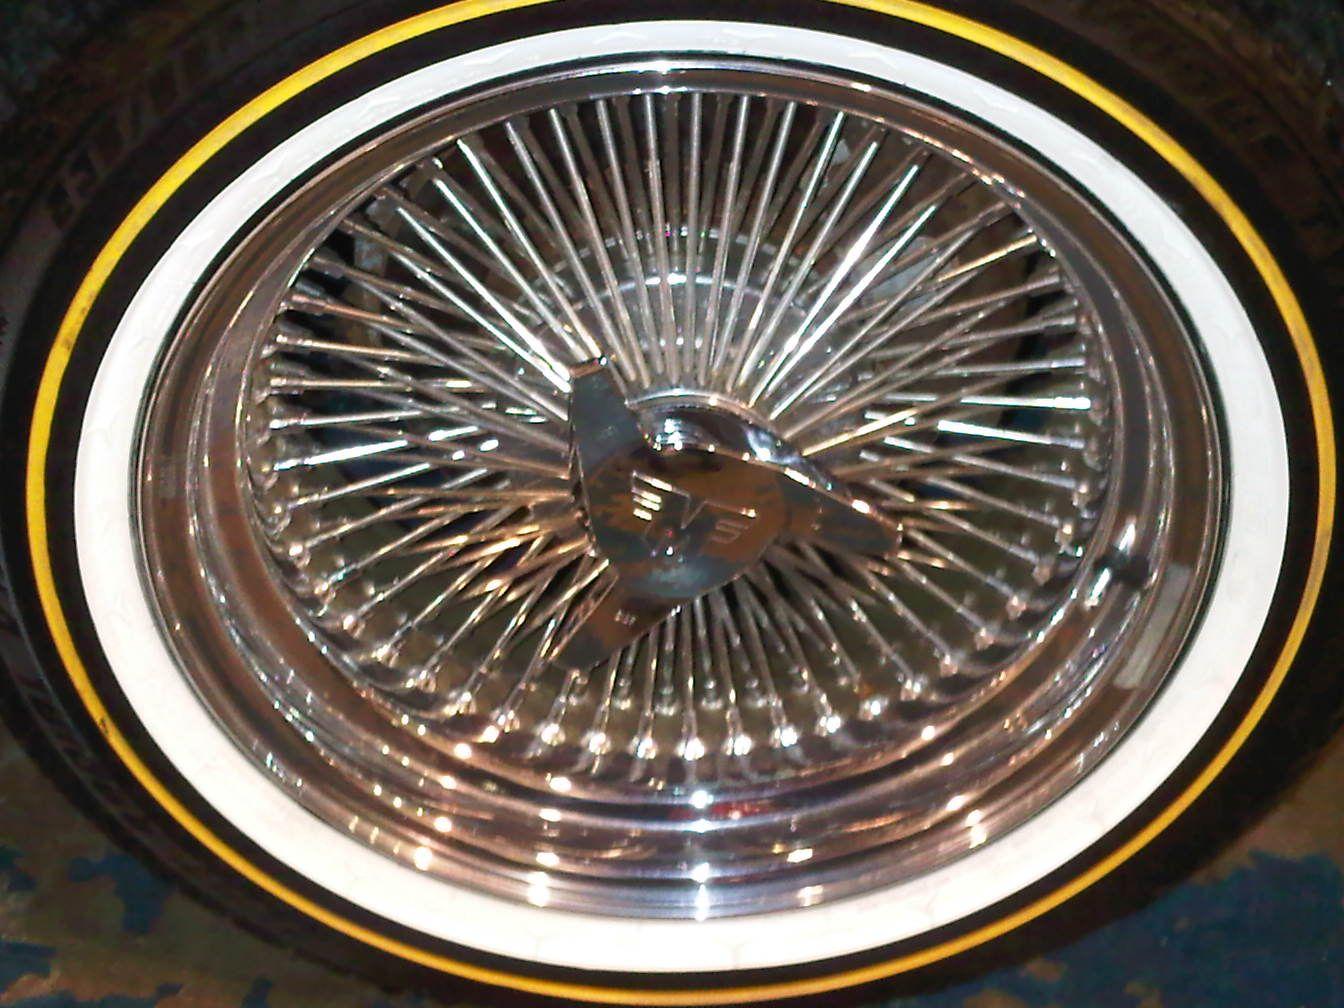 Custom Dayton Rims Ok 17inch Dayton Wheels Vogue Tires Mean Street Look Ebro Dayton Wheels Rims And Tires Dayton Rims